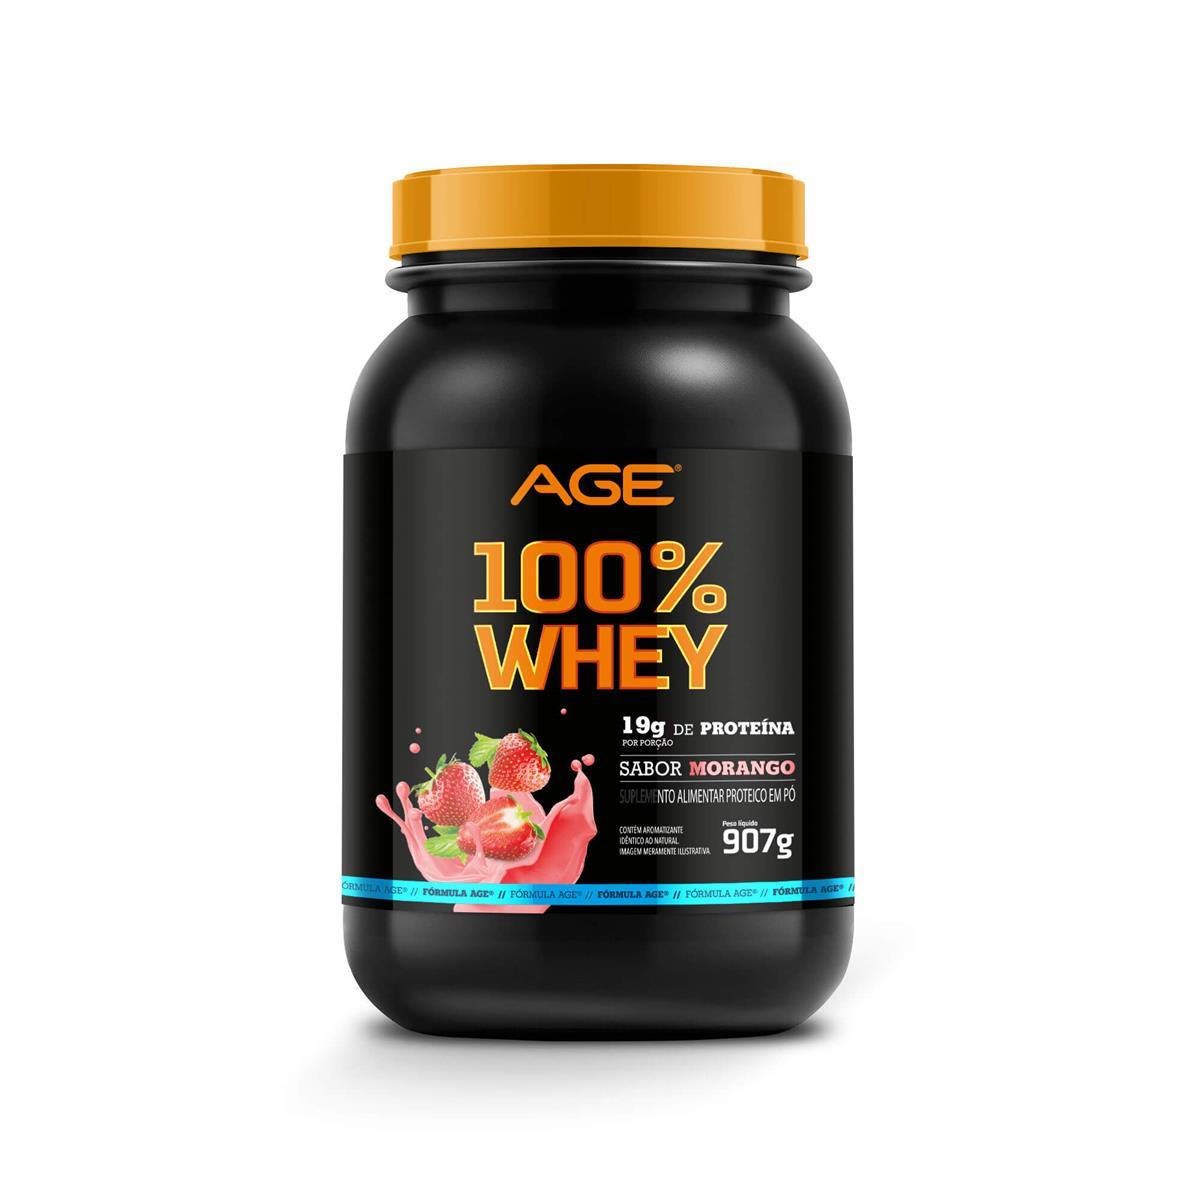 WHEY 100% PURE (900g) - Morango - AGE